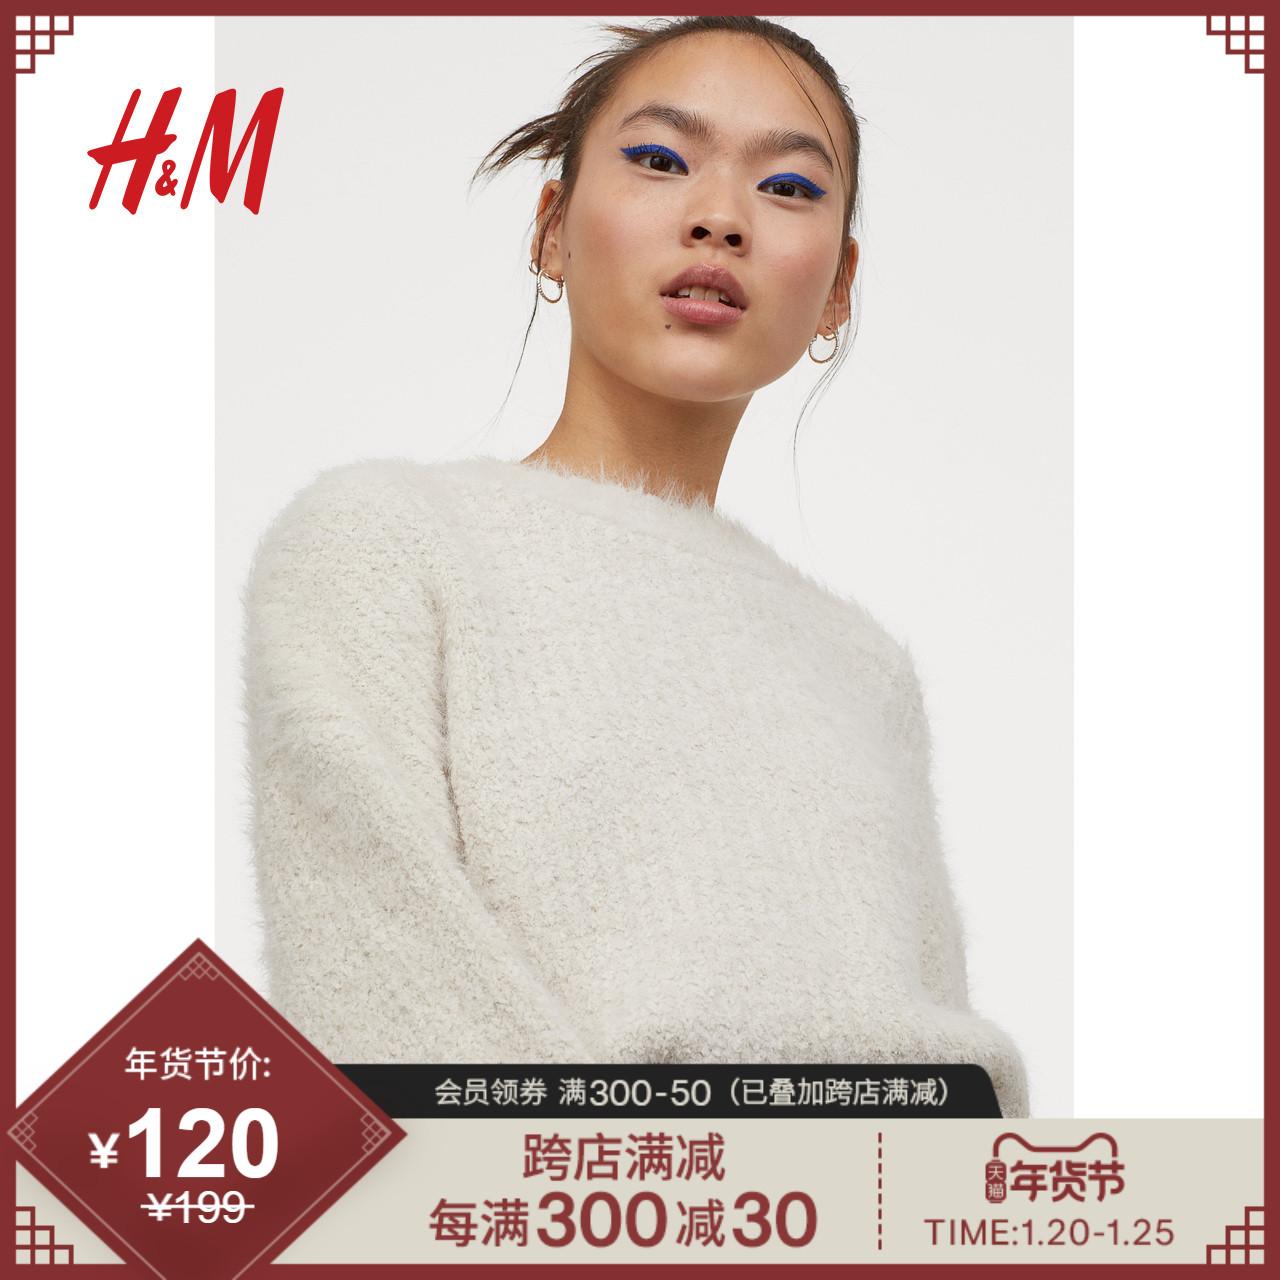 HM 芝麻街联名DIVIDED女装针织衫 秋冬长袖套衫 0820410